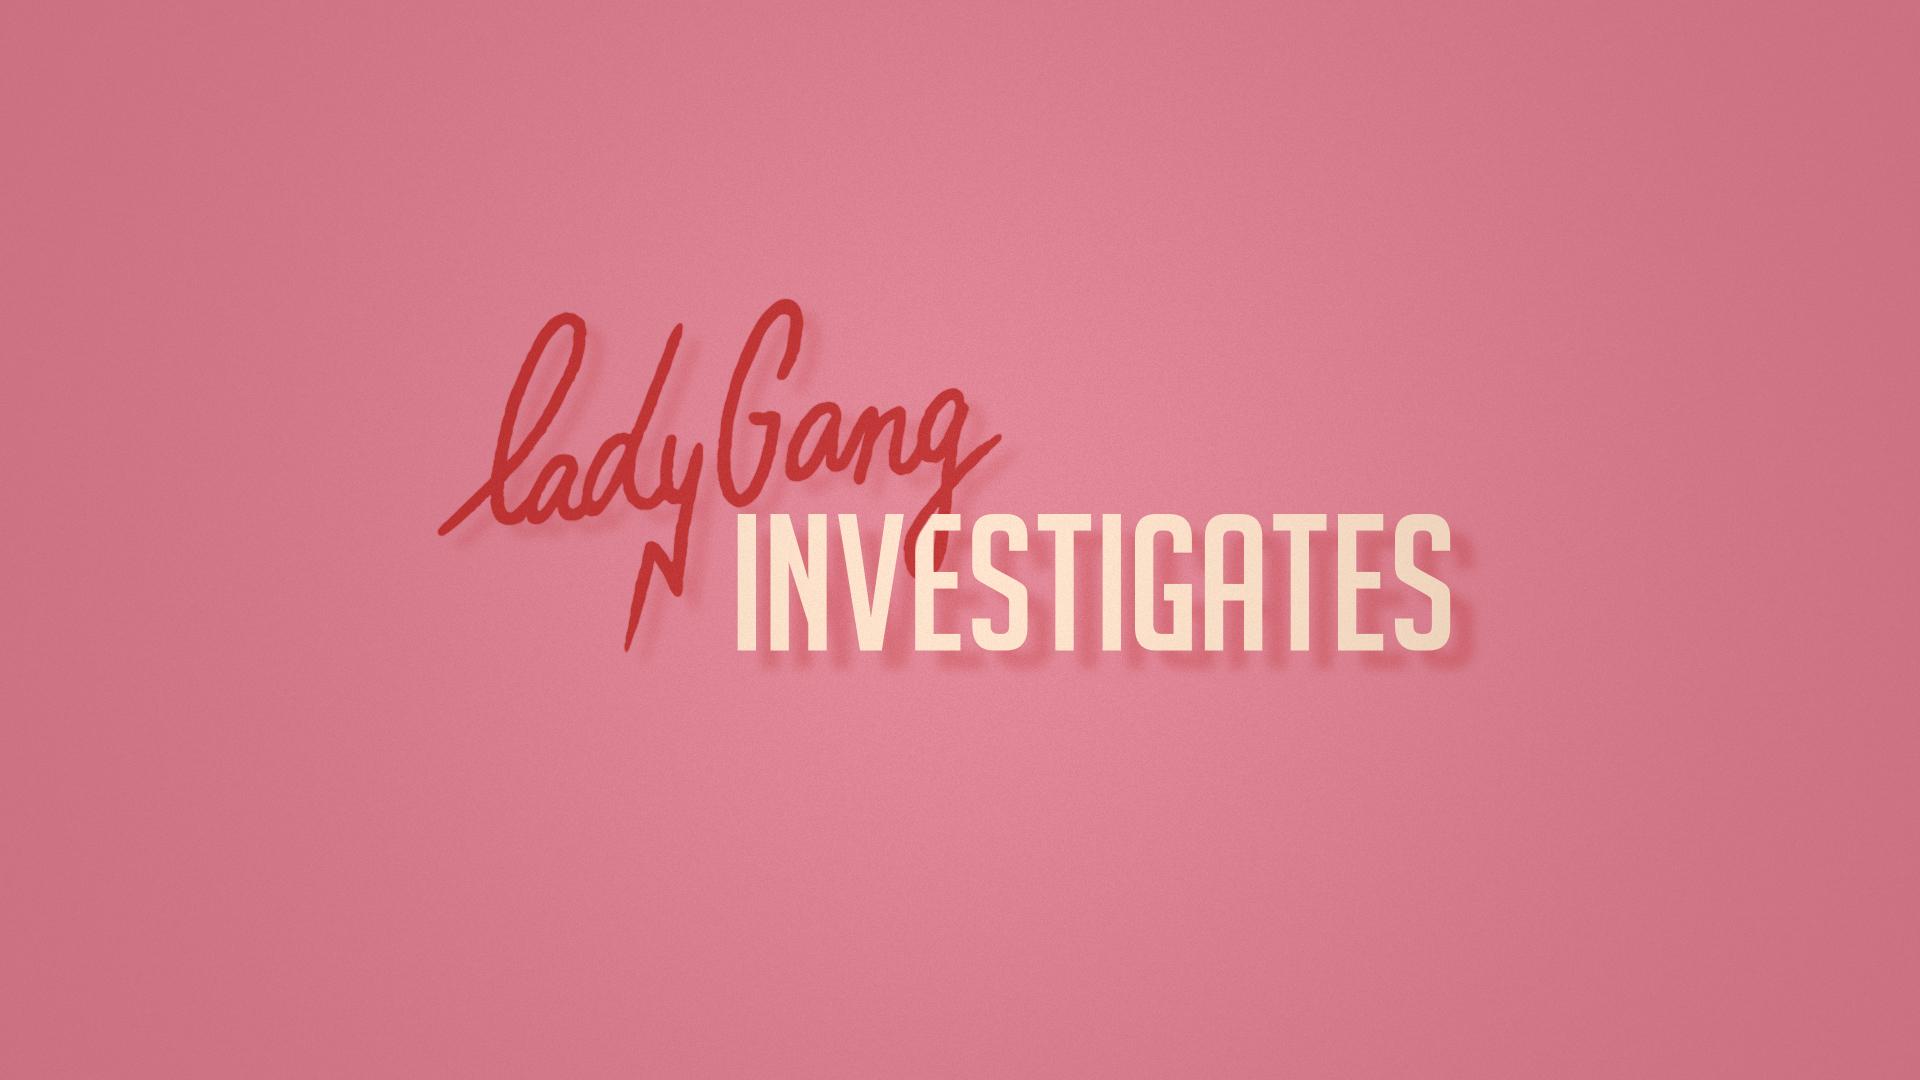 LadyGang_Styleframes_Investigates_02 (0-00-00-00).jpg